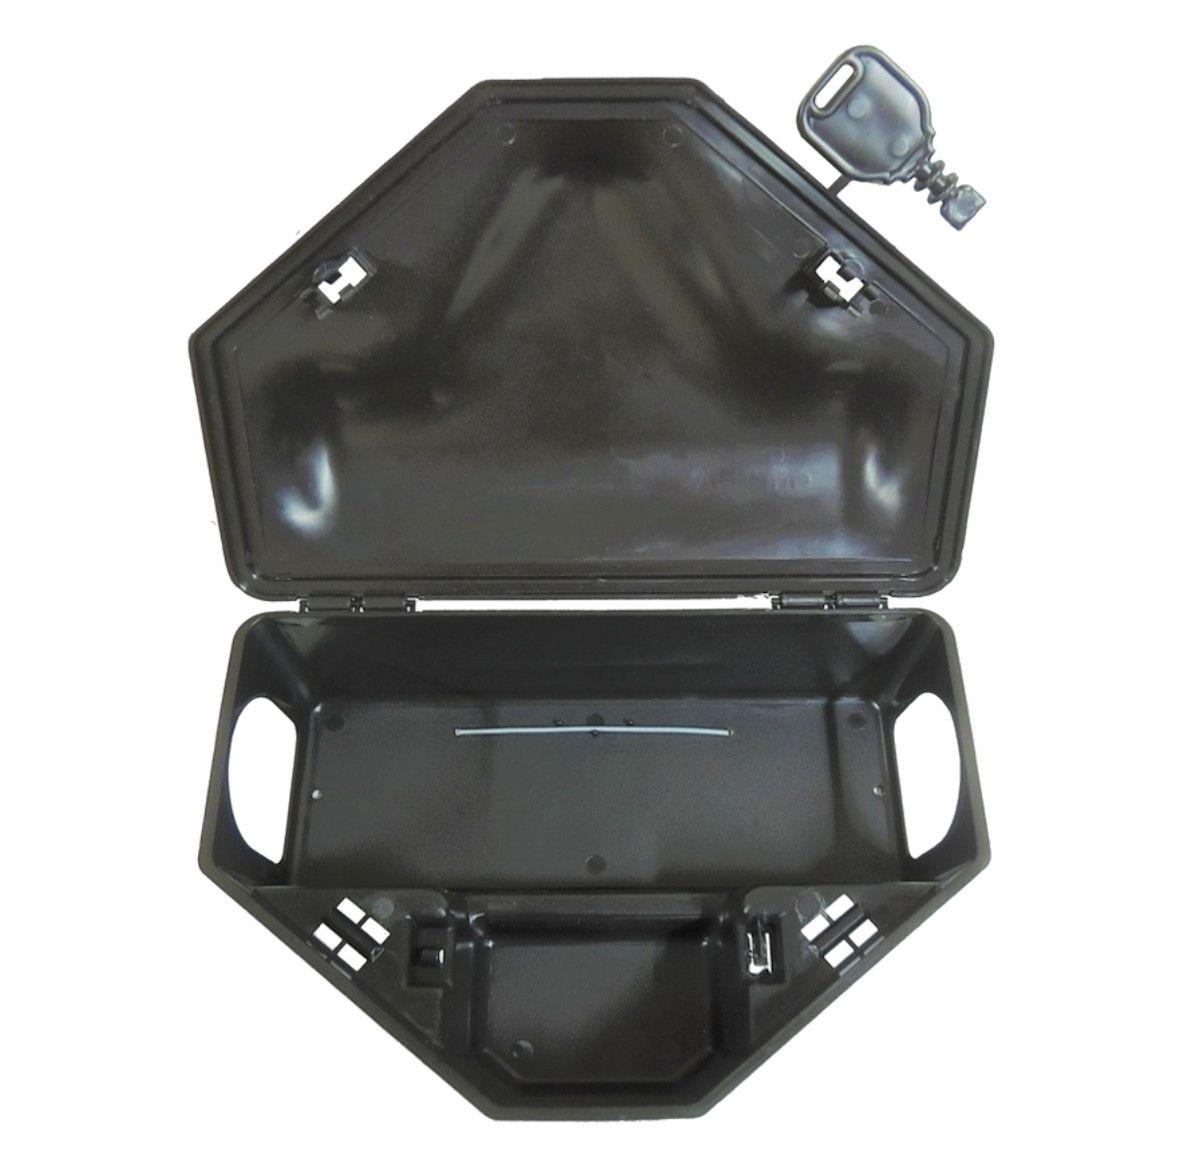 Kit 44 Porta Isca C/2 Chaves + 44 Bloco Extrusado Mata Seca